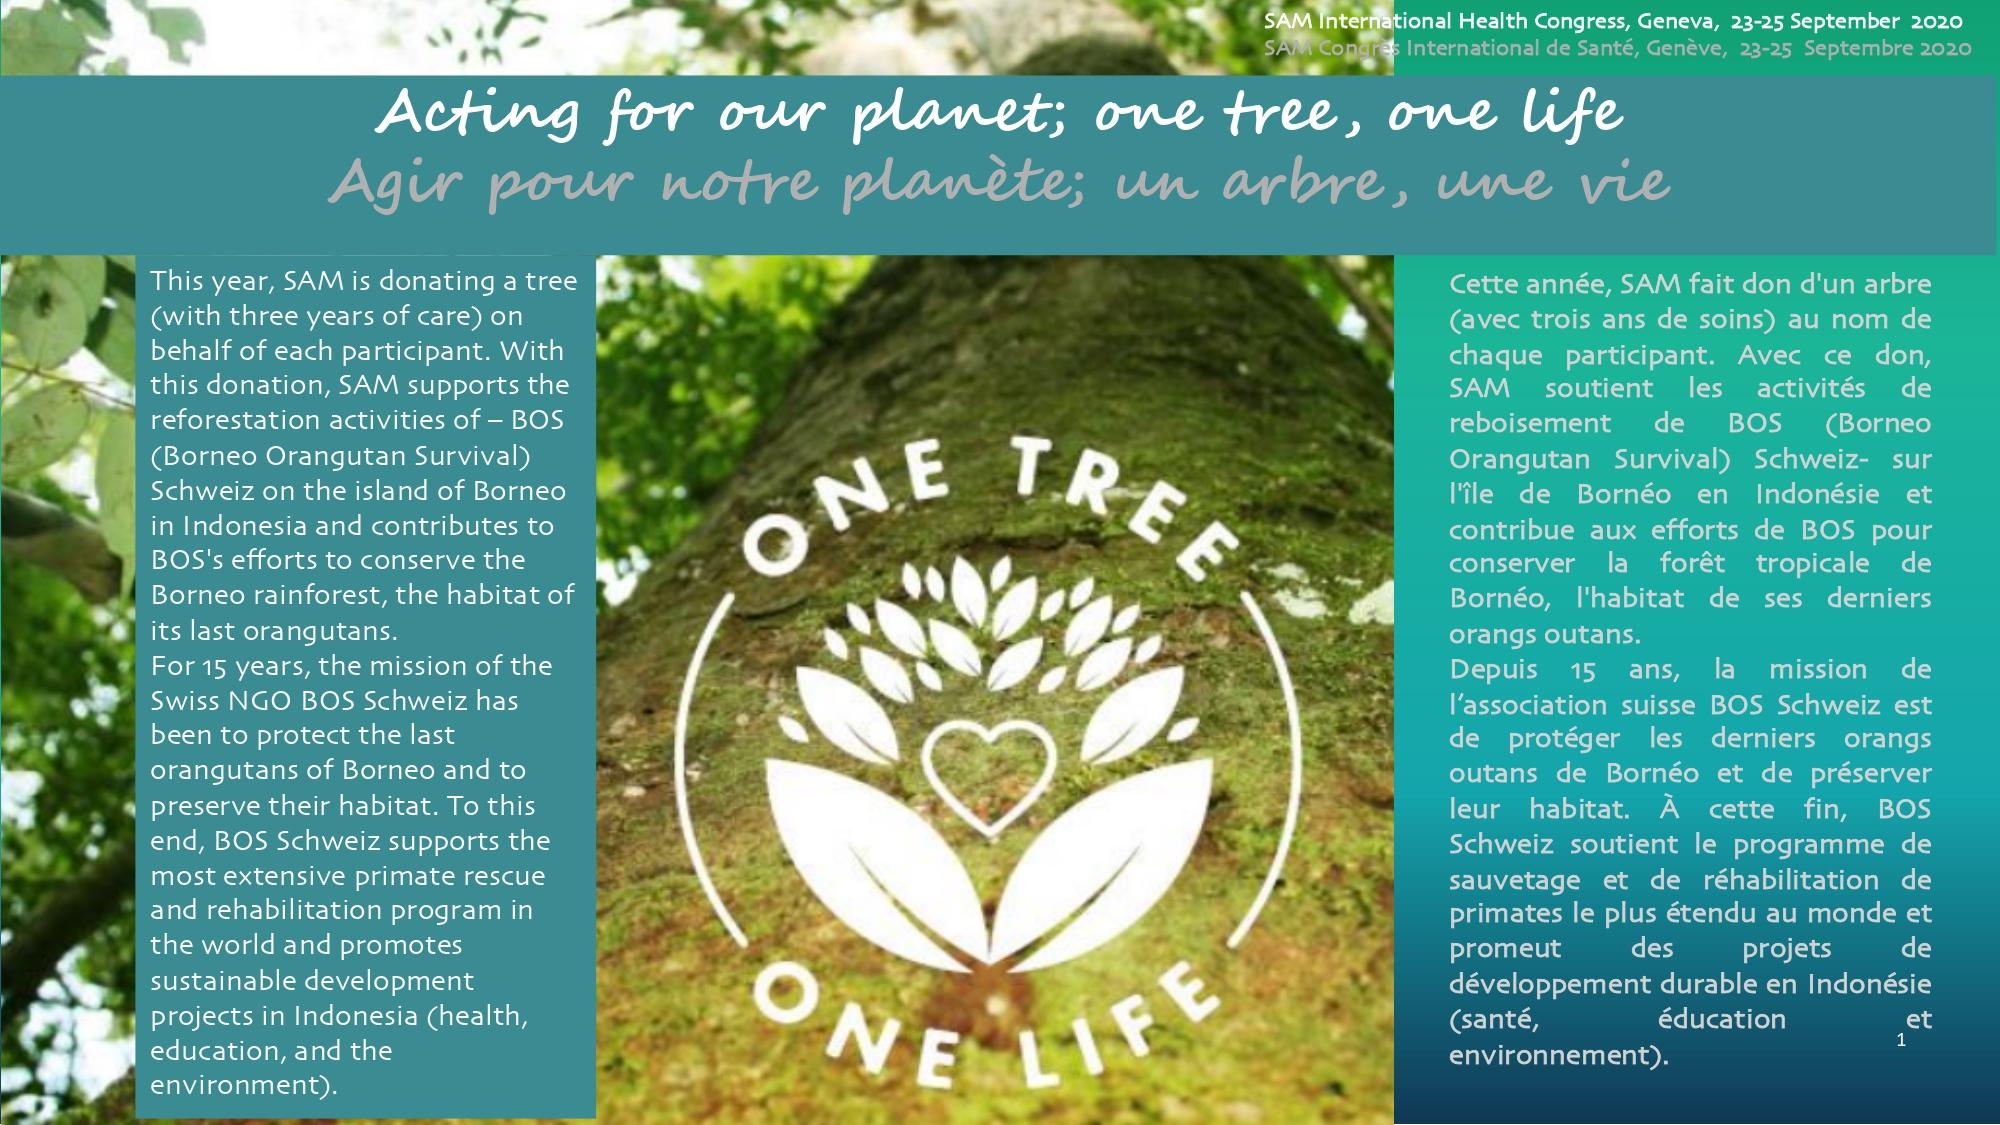 One tree one life IHC